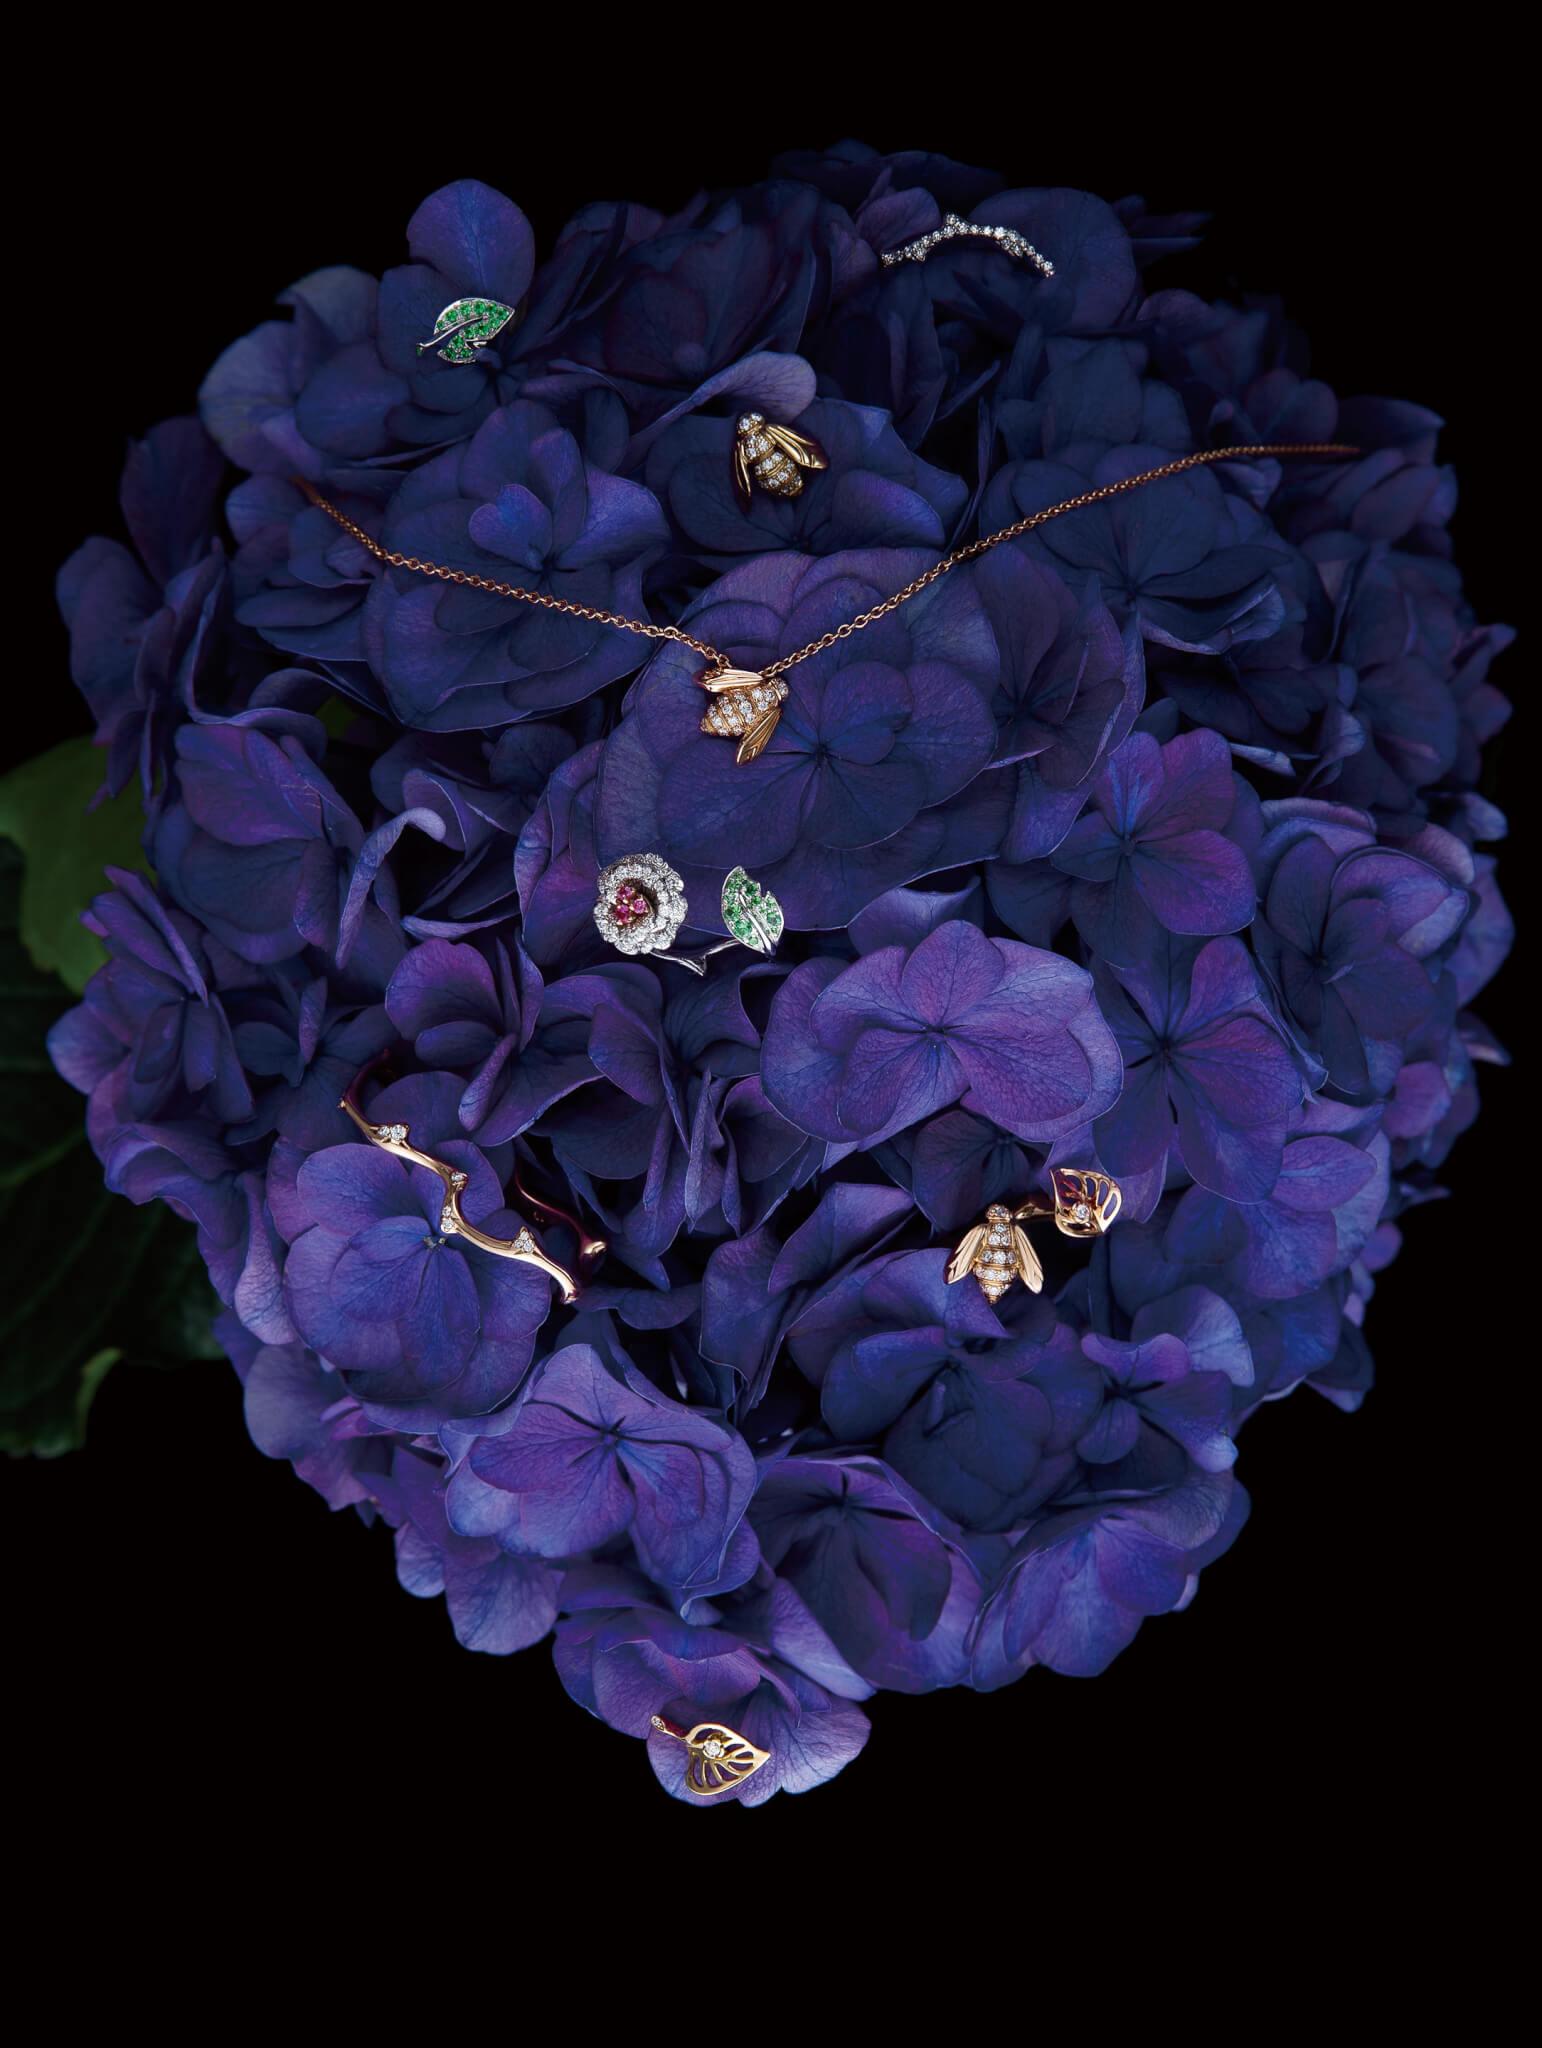 (上起)Bois de Rose 18K 白金及鑽石耳環 $28,900/單隻 Rose Dior Bagatelle 18K白金及沙芙萊石耳環 $14,900/單隻 Rose Dior Pre Catelan 18K黃金及鑽石耳環 $25,900/對 Rose Dior Pre Catelan 18K玫瑰金及鑽石頸鏈 $24,900 Rose Dior Bagatelle 18K白金及玫瑰金、鑽石、粉紅藍寶石及沙芙萊石榴石戒指 $74,000 Bois de Rose 18K玫瑰金及鑽石戒指 $30,800 Rose Dior Pre Catelan 18K玫瑰金及鑽石戒指 $43,800 Rose Dior Pre Catelan 18K黃金及鑽石耳環 $25,900/對